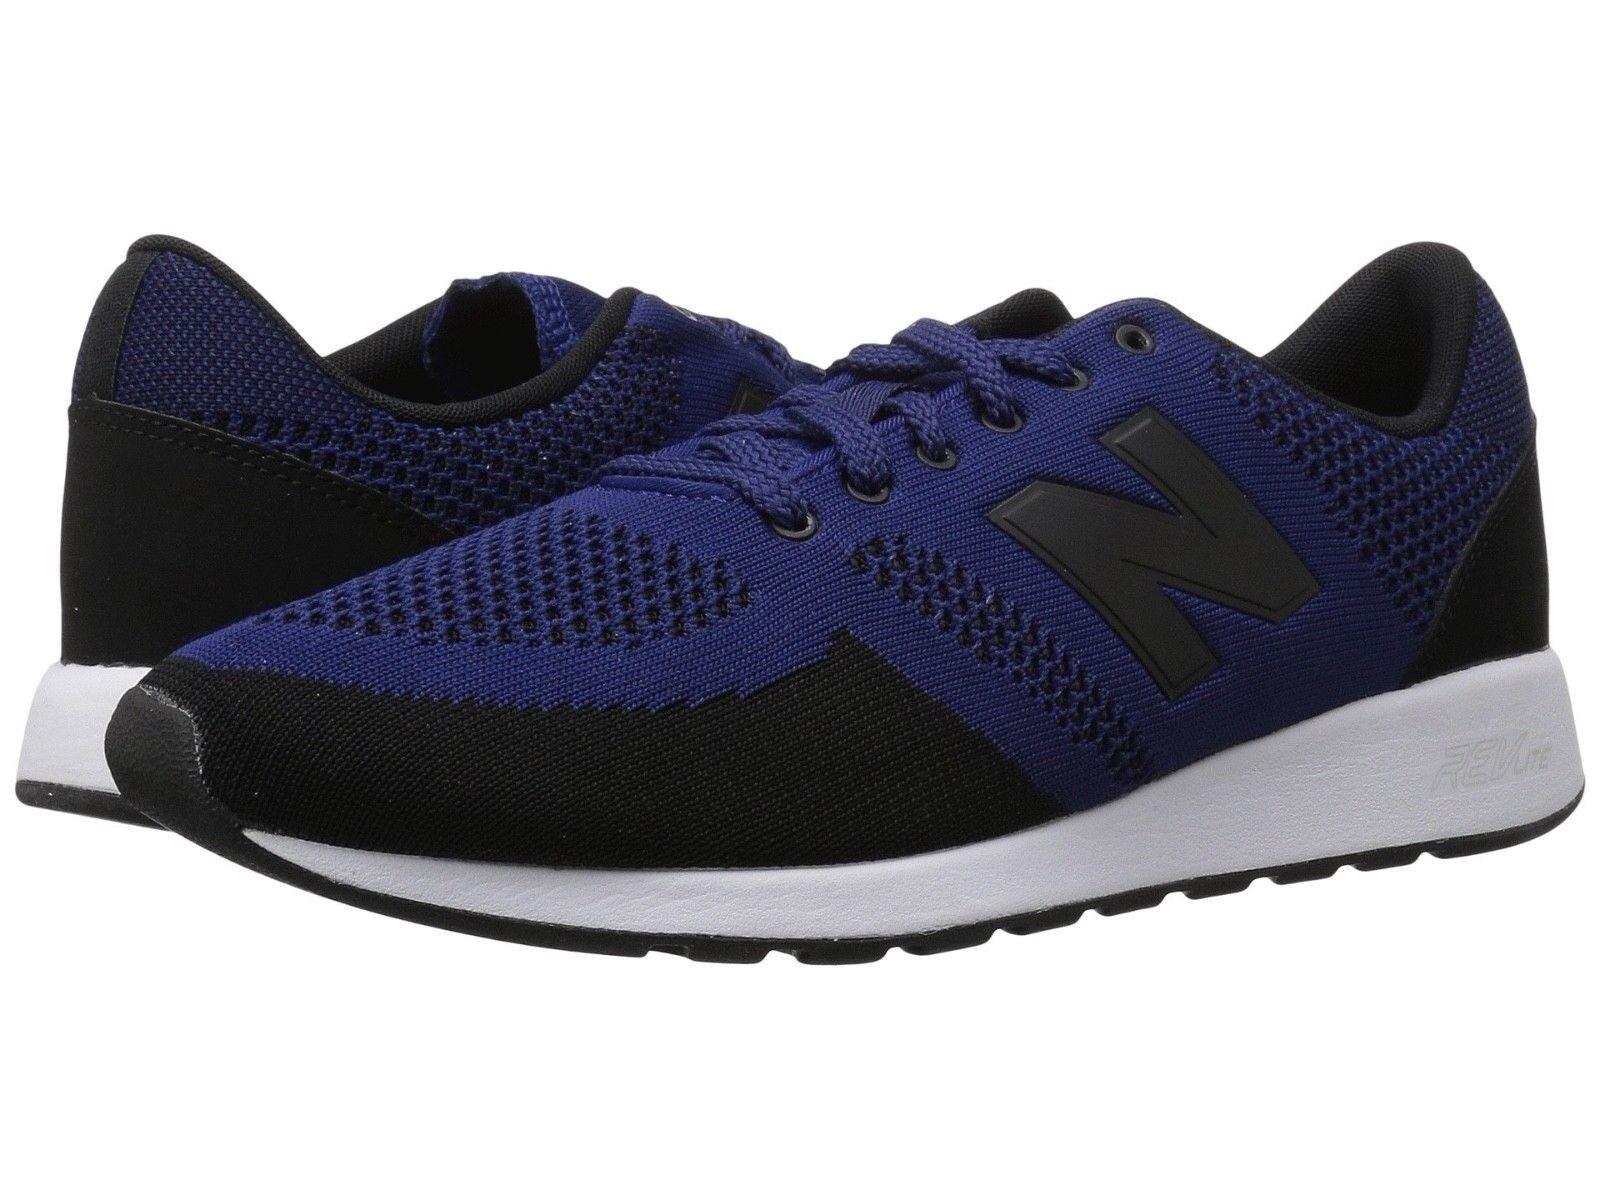 Tenis atléticas de Hombre New Balance Zapatillas Parte superior de malla azul real MRL420RO